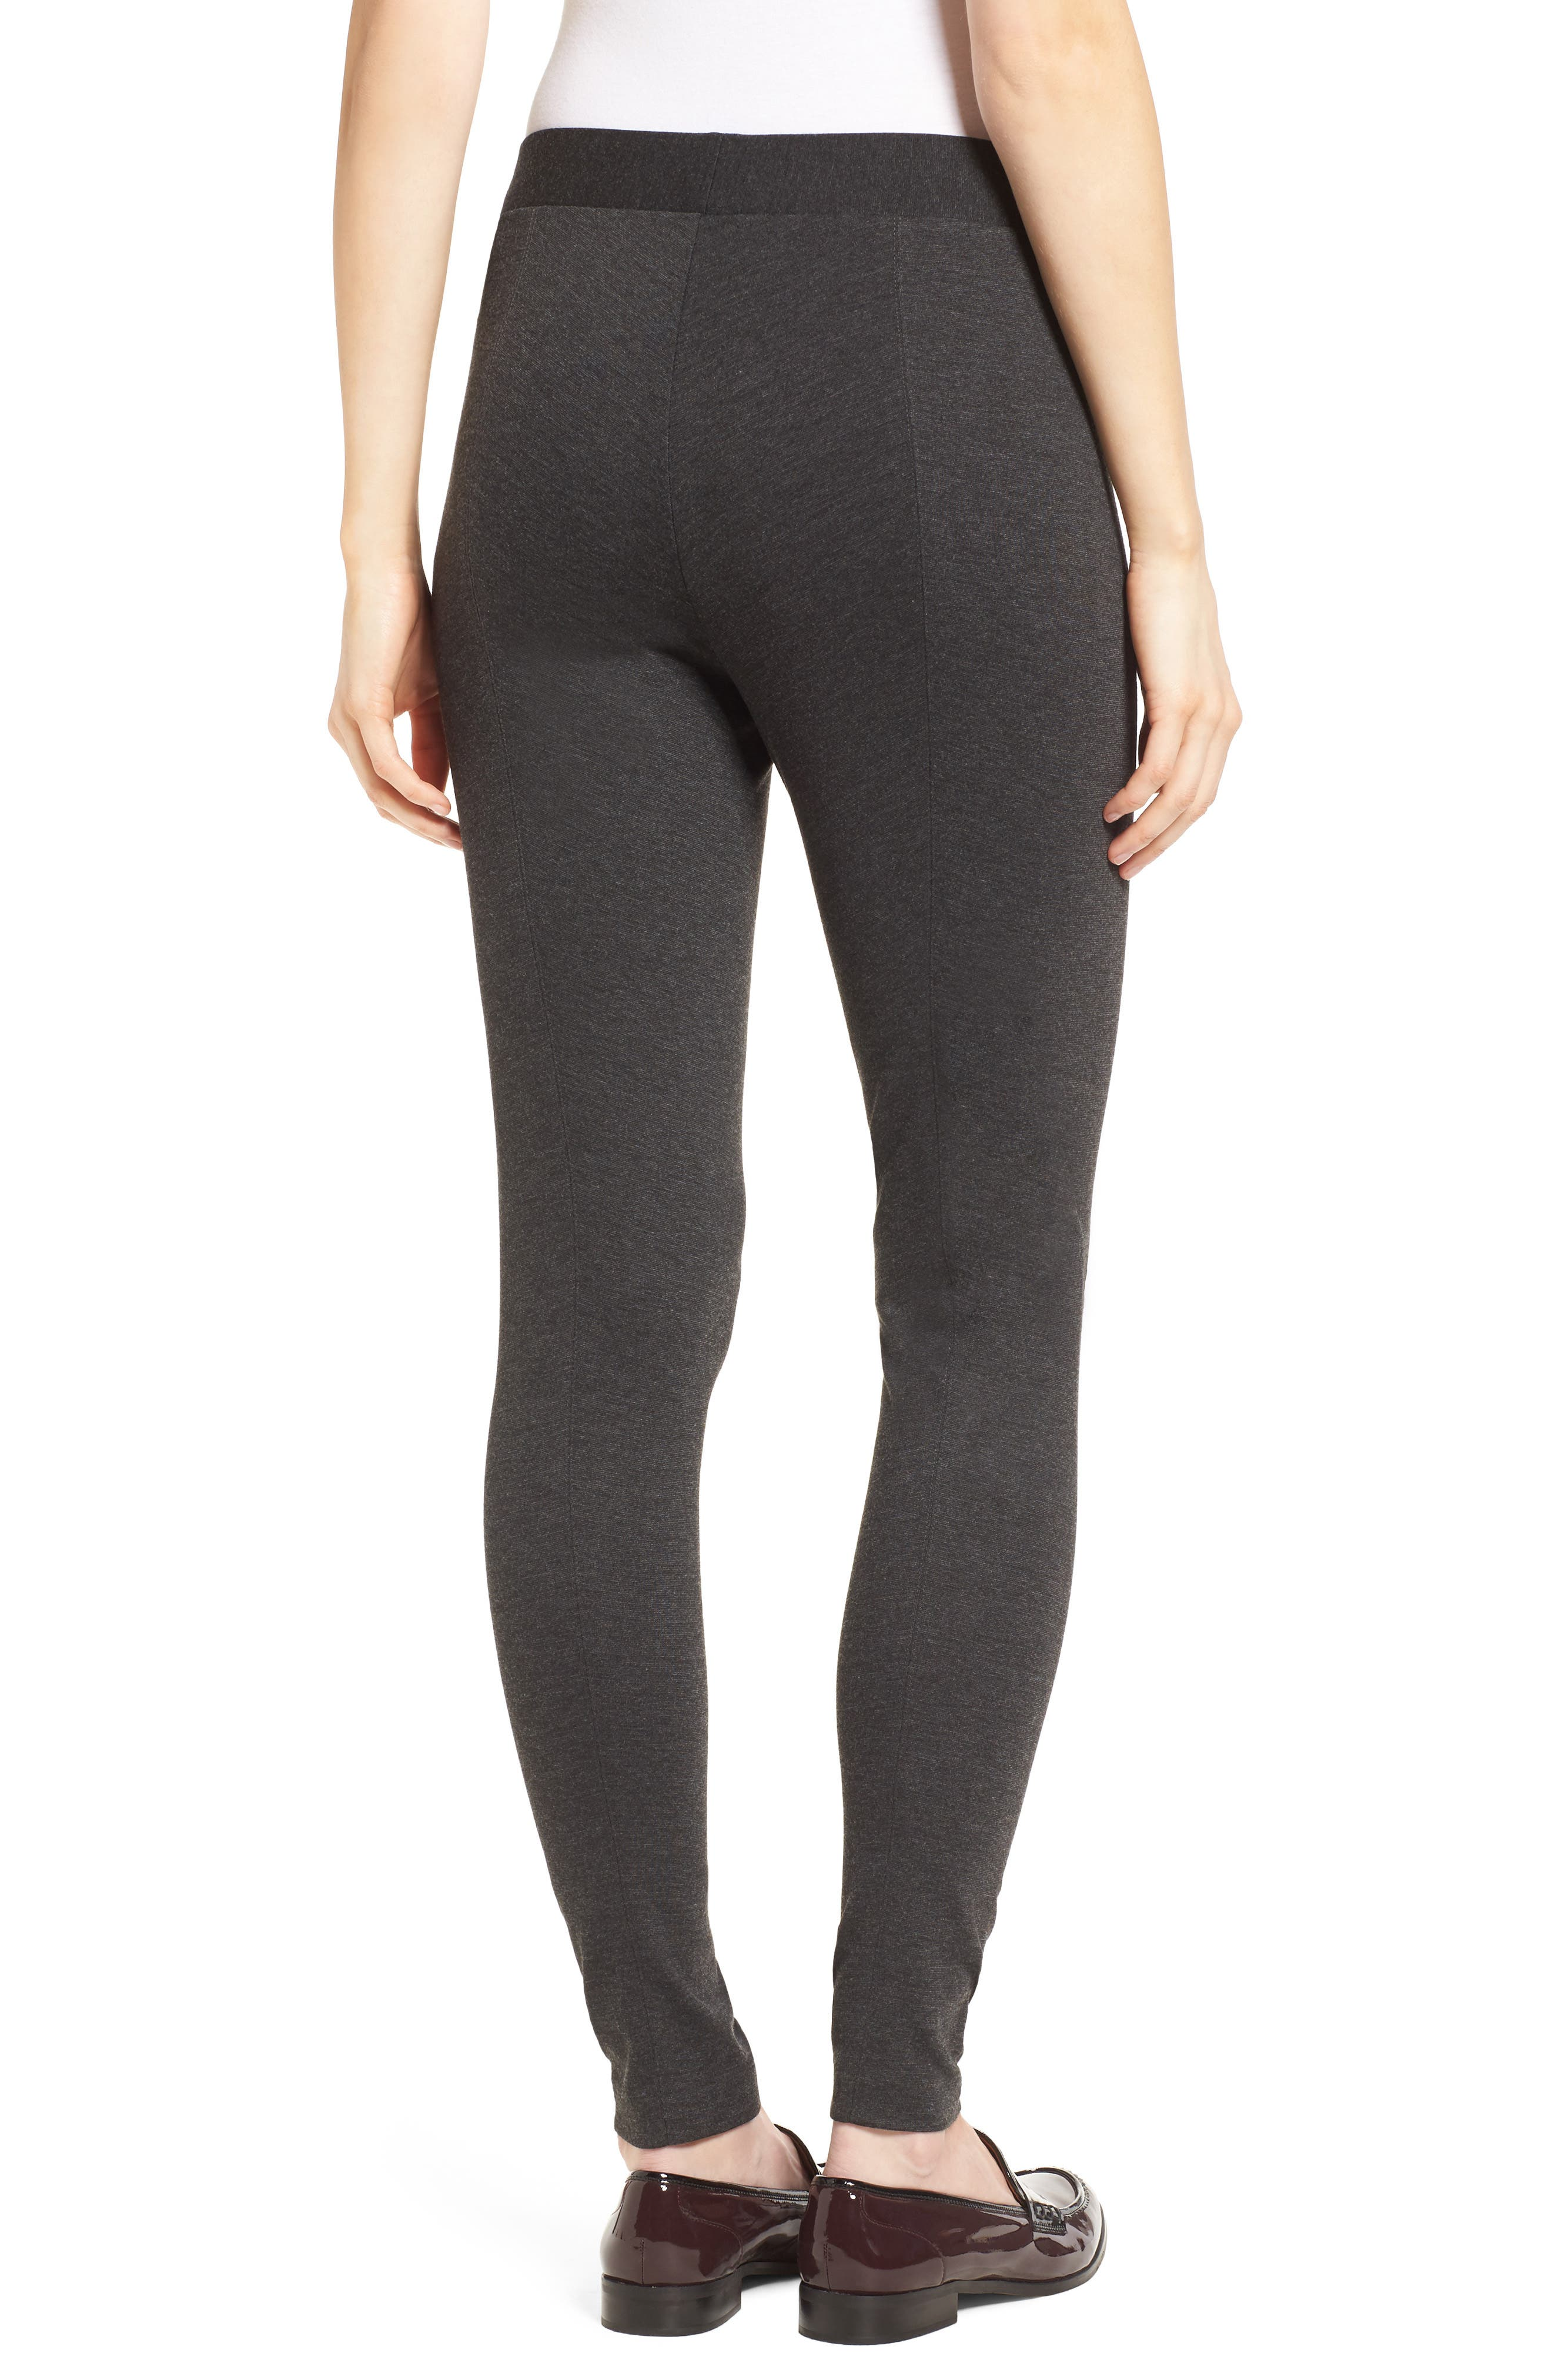 4e71215b0ec8c Women's Vince Camuto Pants & Leggings | Nordstrom